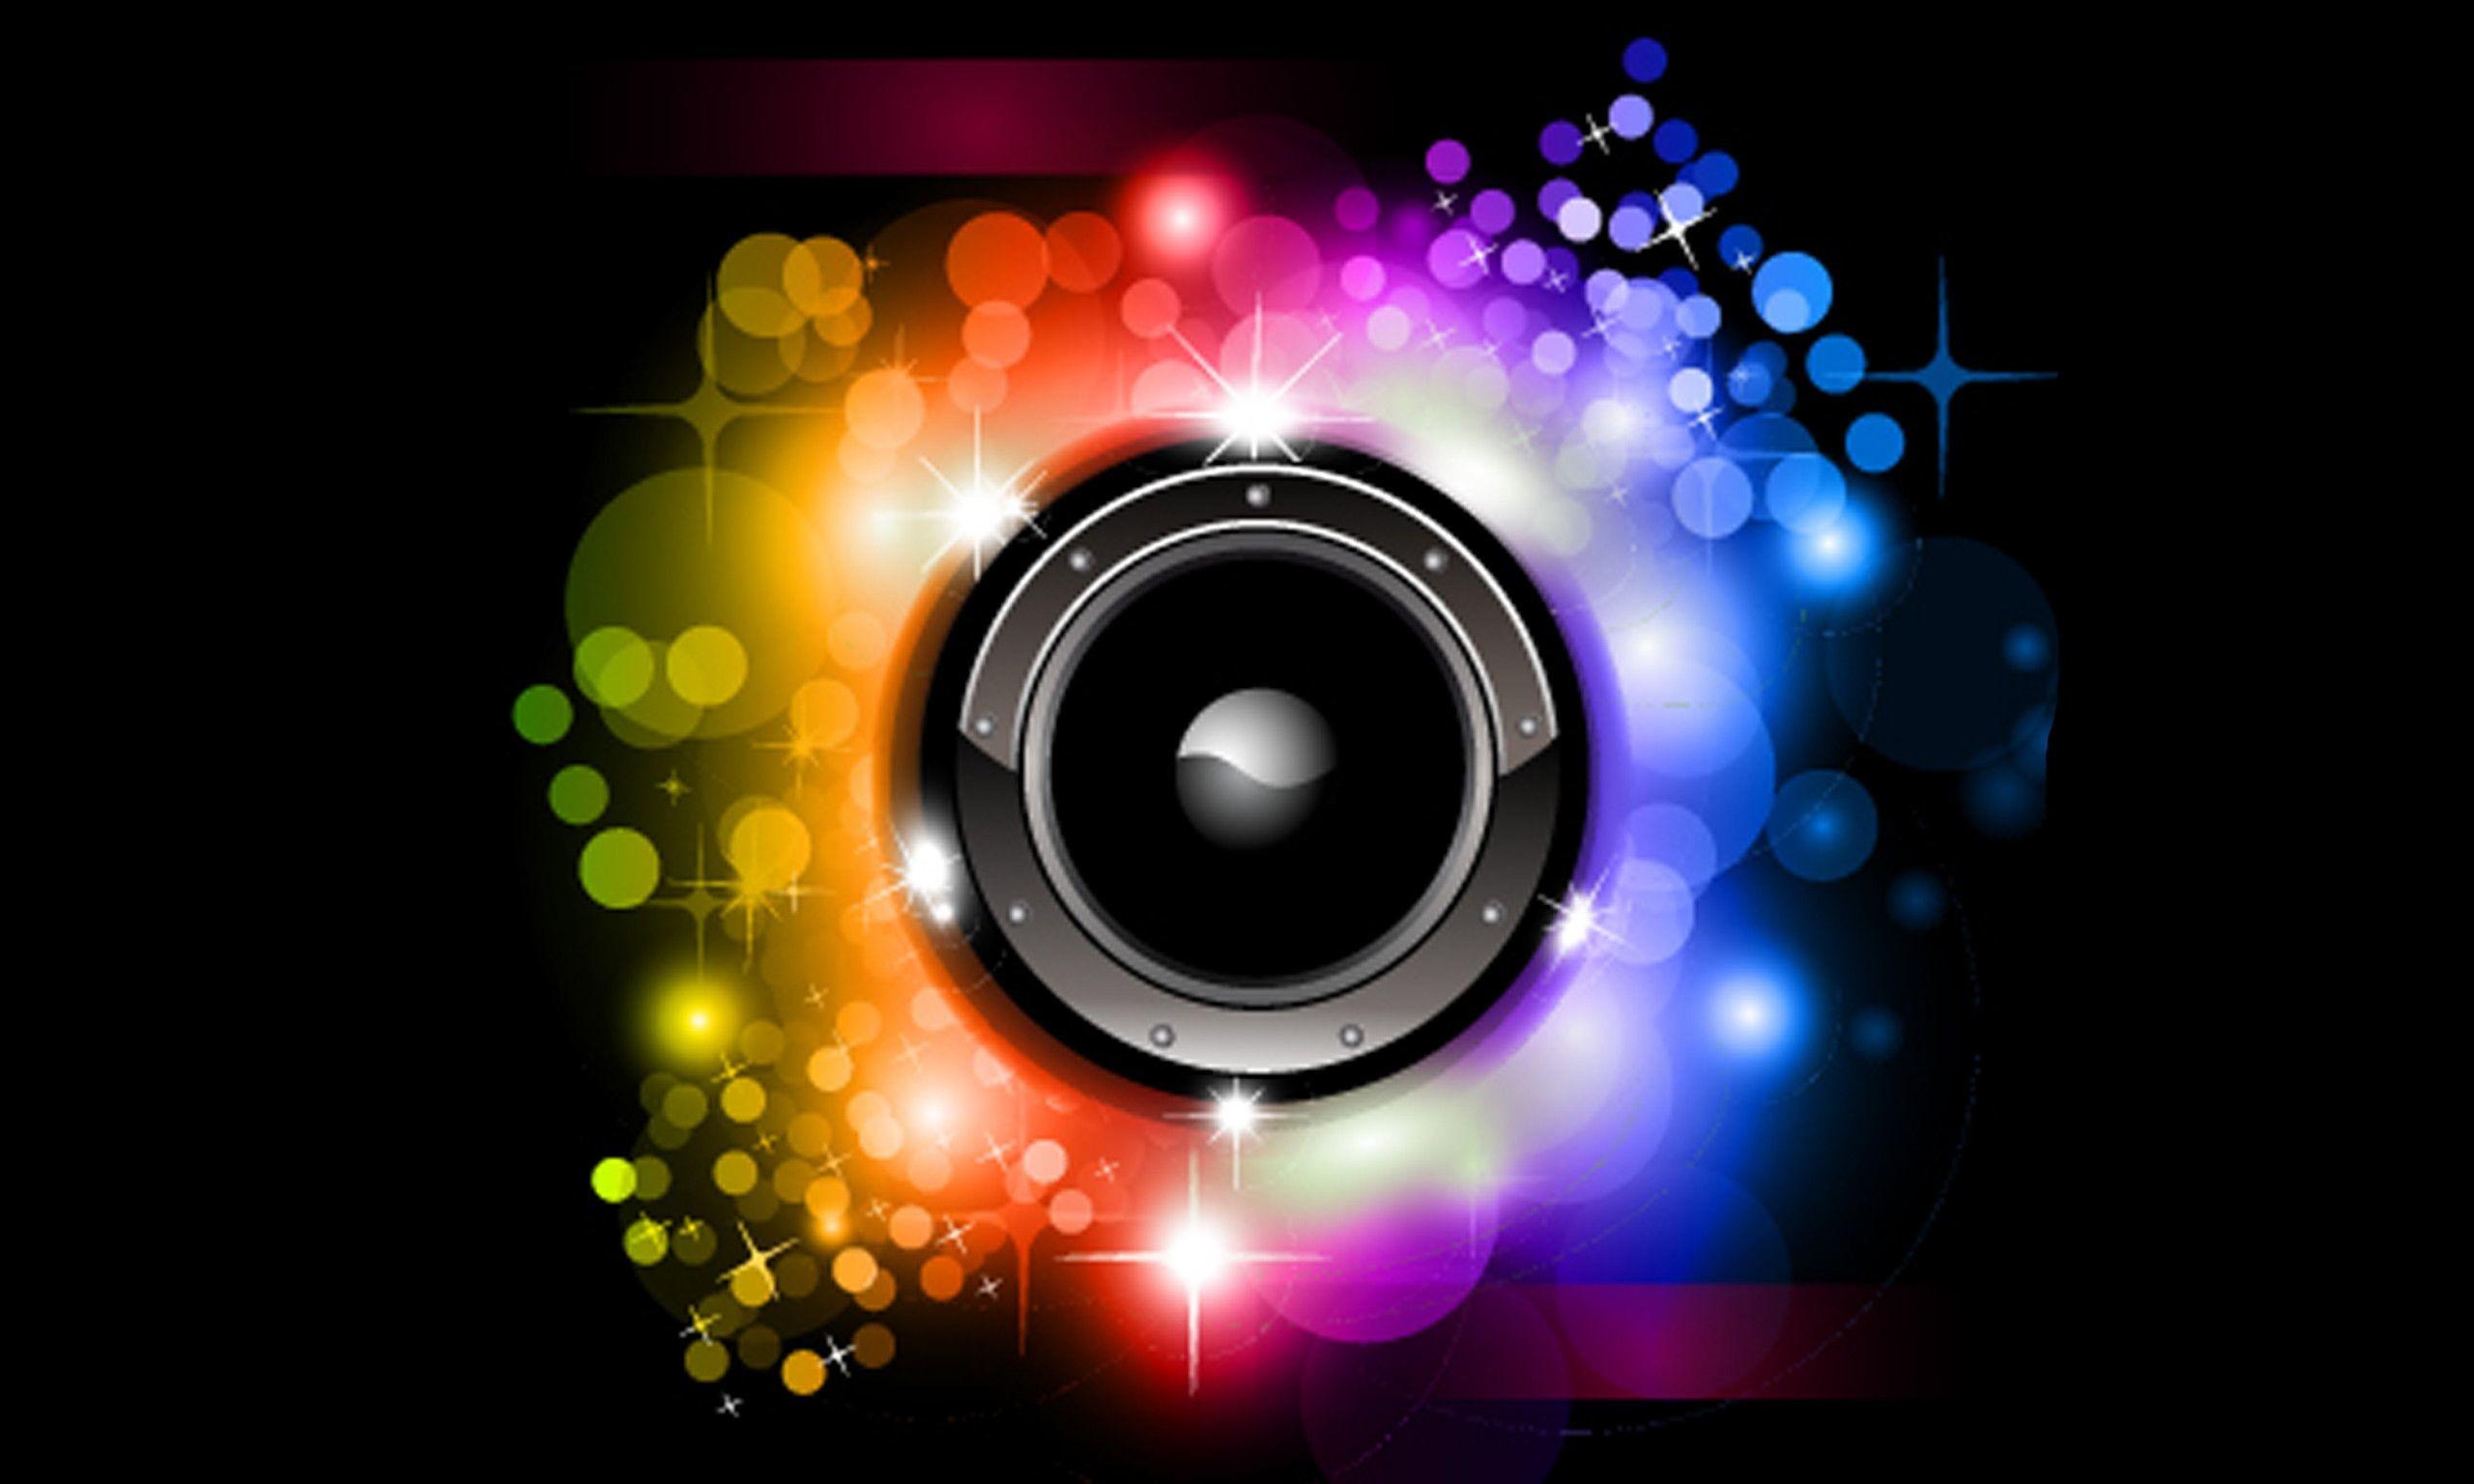 Dj wallpaper full hd 79 images - Wallpaper artist music ...